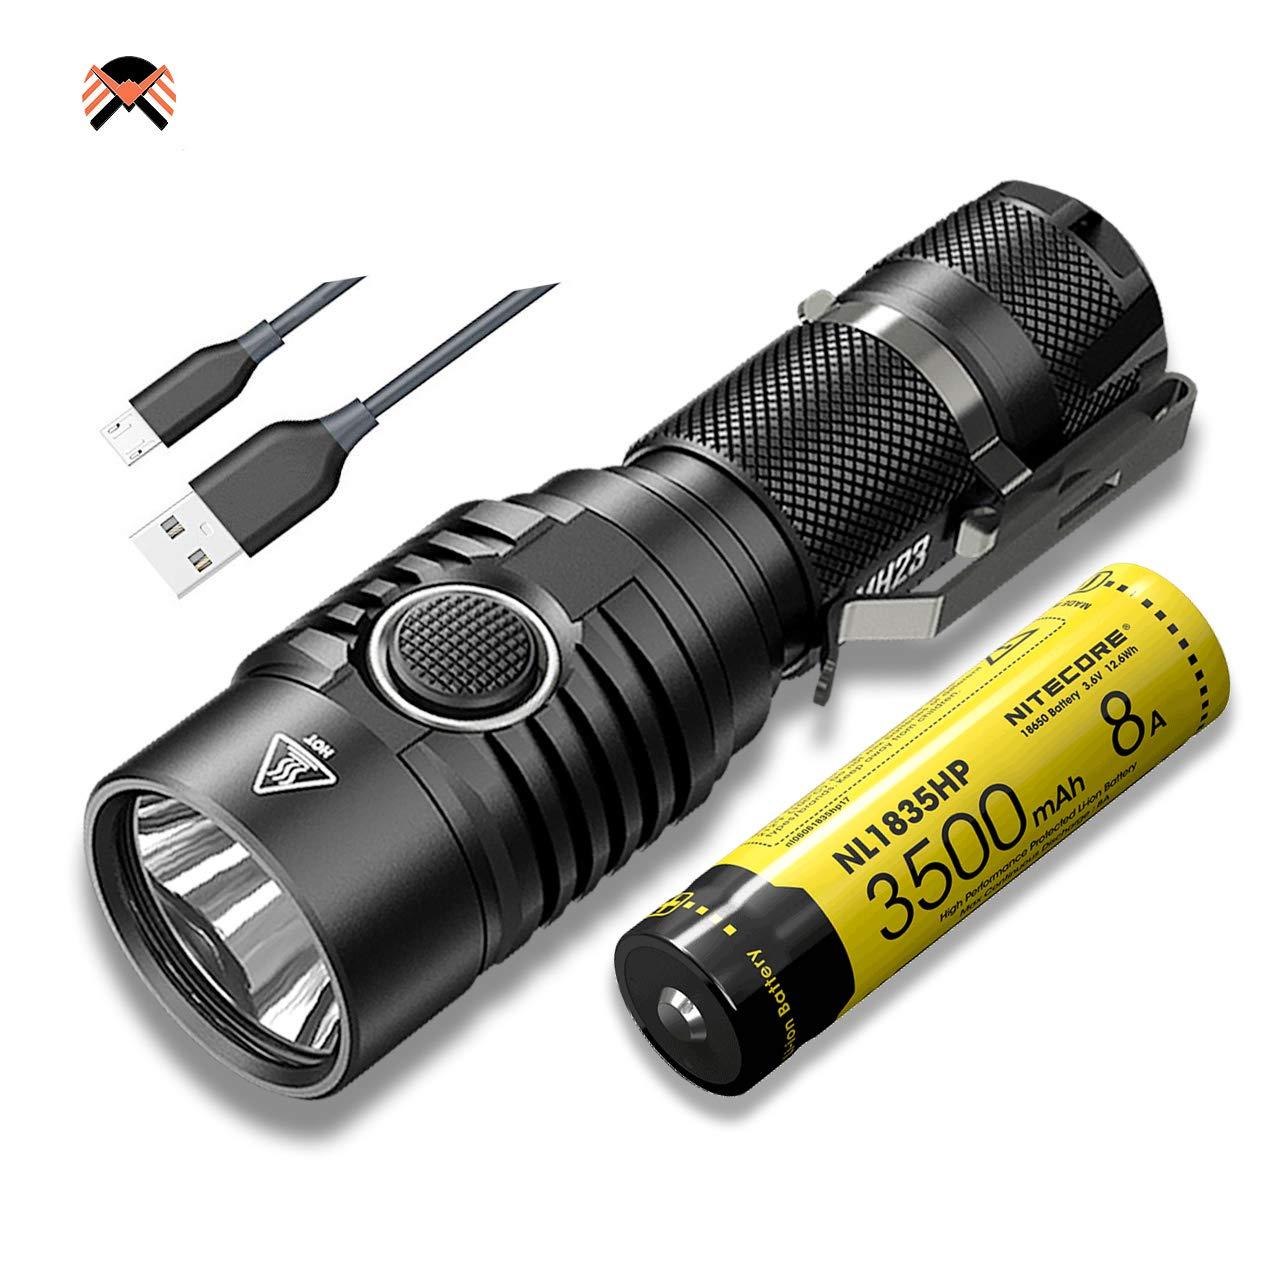 NITECORE MH23 Linterna LED Recargable USB Alta Potencia 1800 Lú menes 8 Modos de Iluminació n Resistente al Agua IPX8 ([ INCLUYE Baterí a Recargable NL1835HP ])